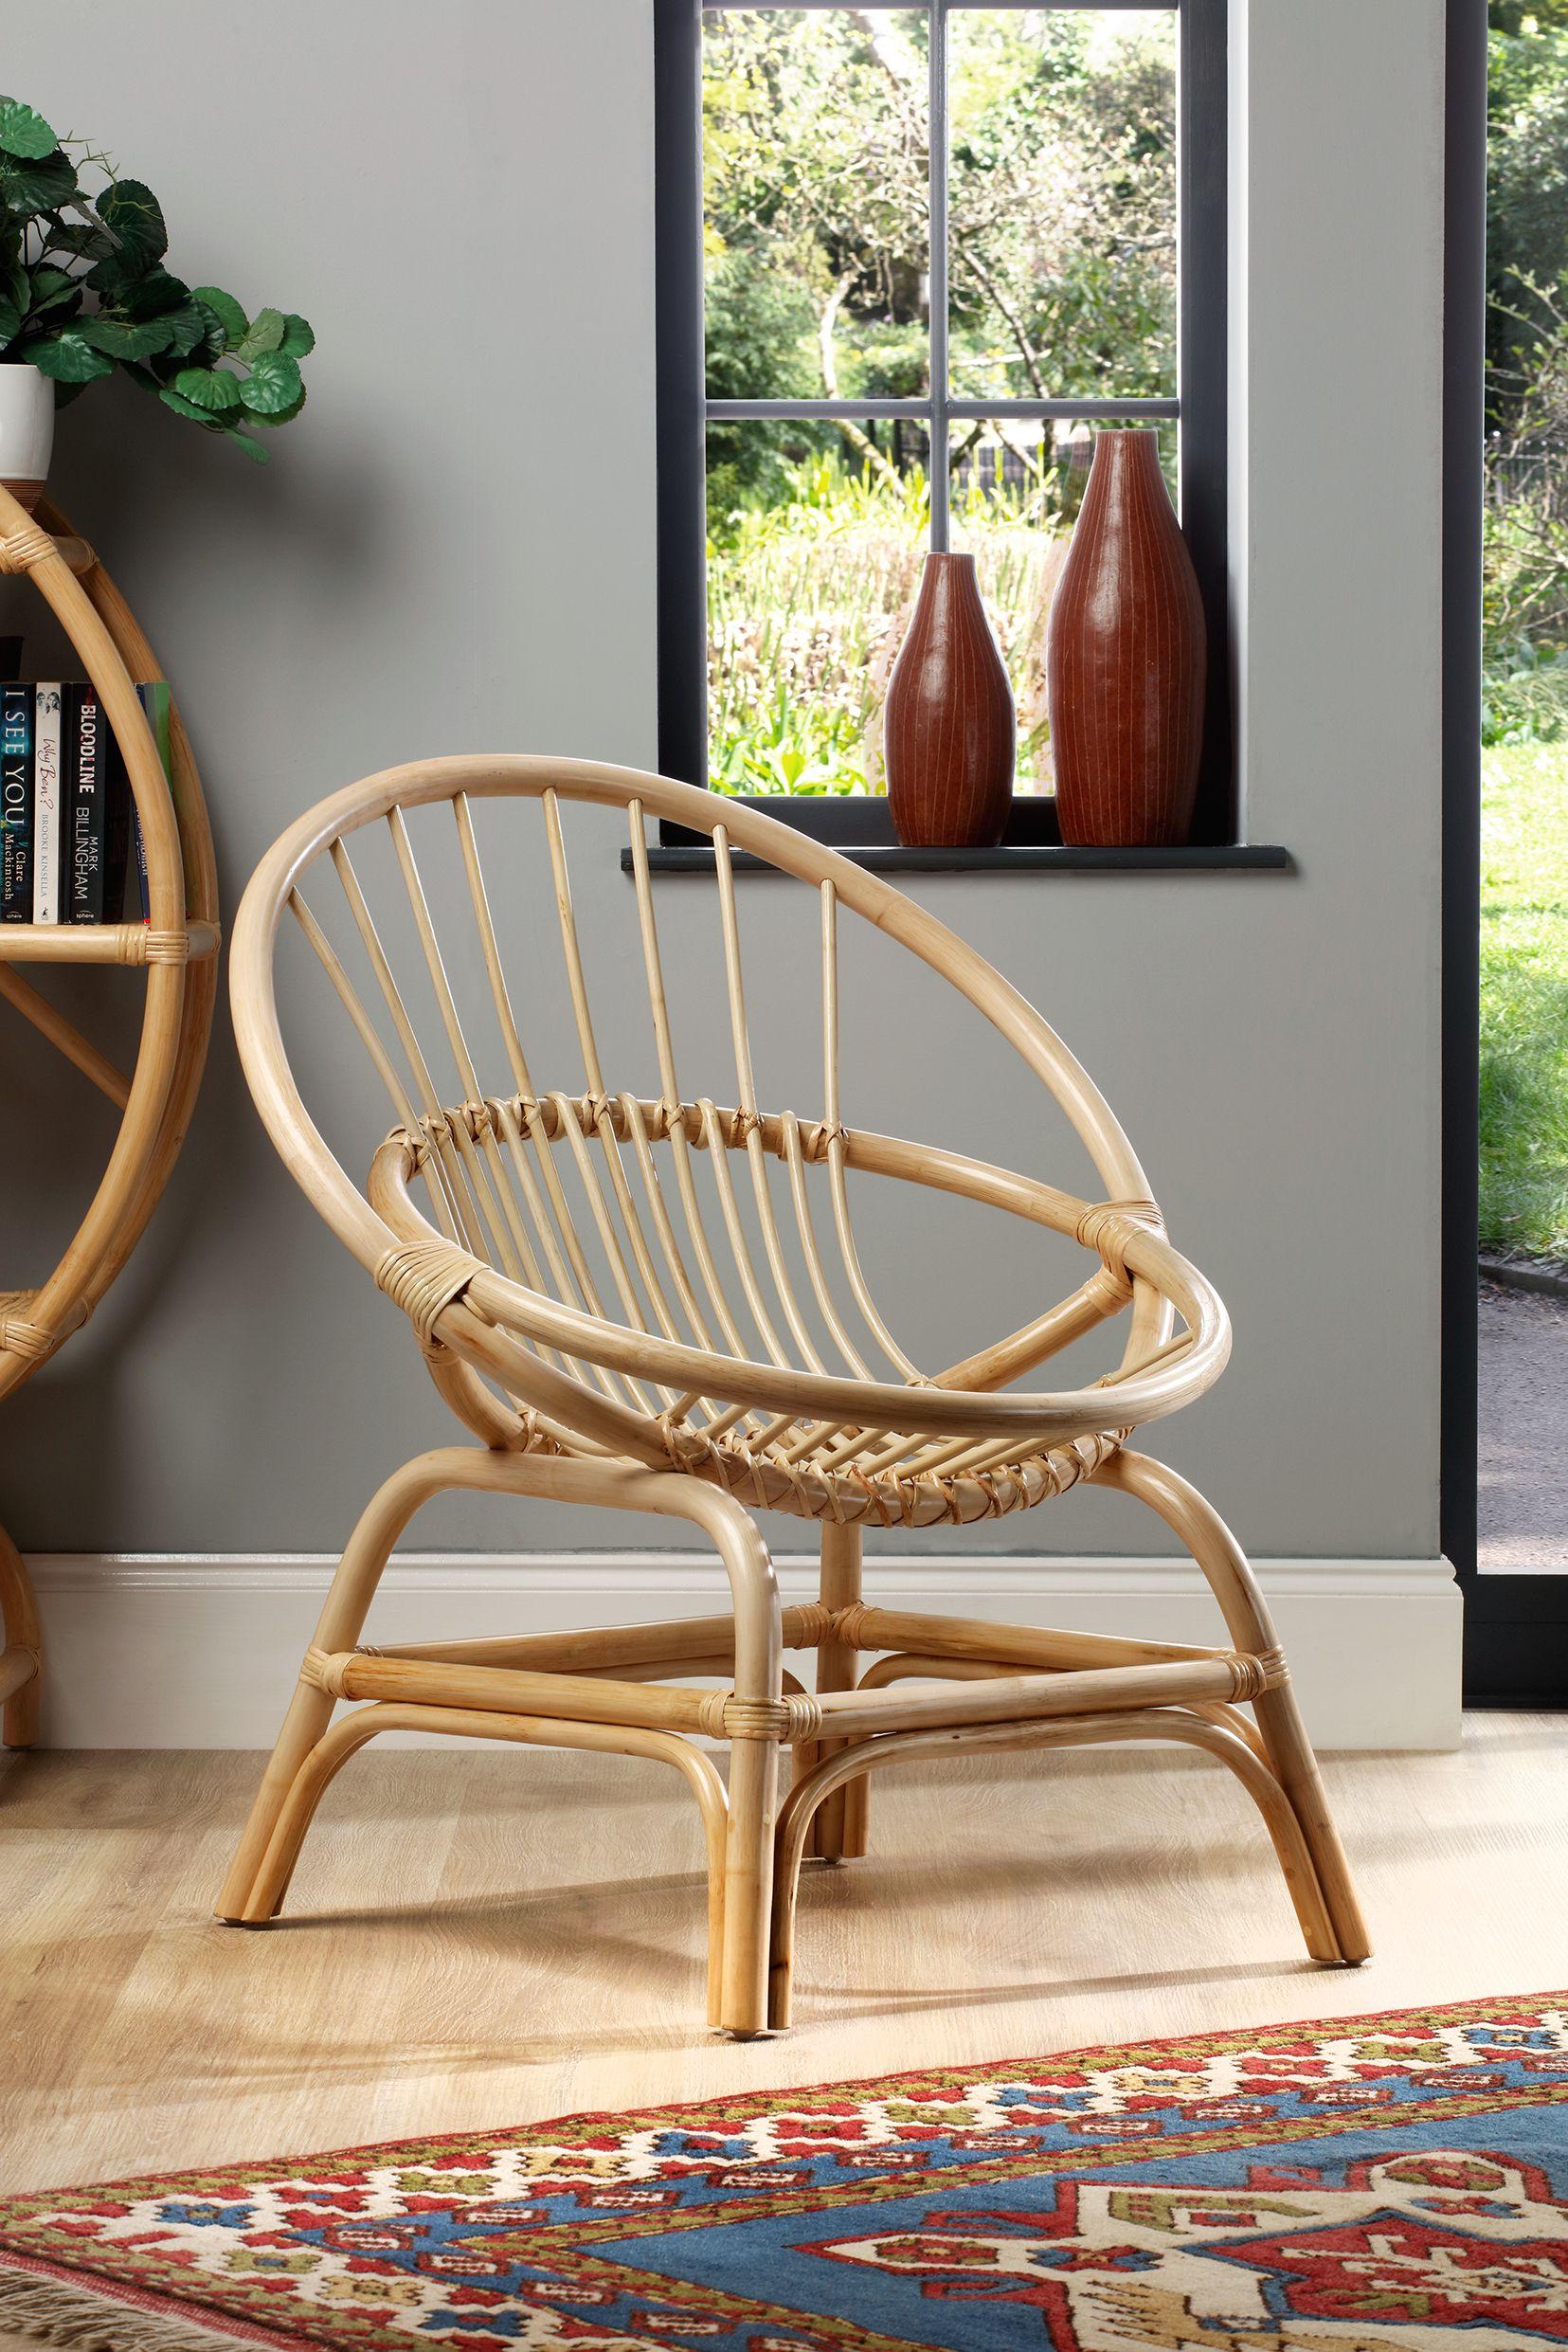 Indoor Outdoor Furniture in 2020 Furniture, Cane